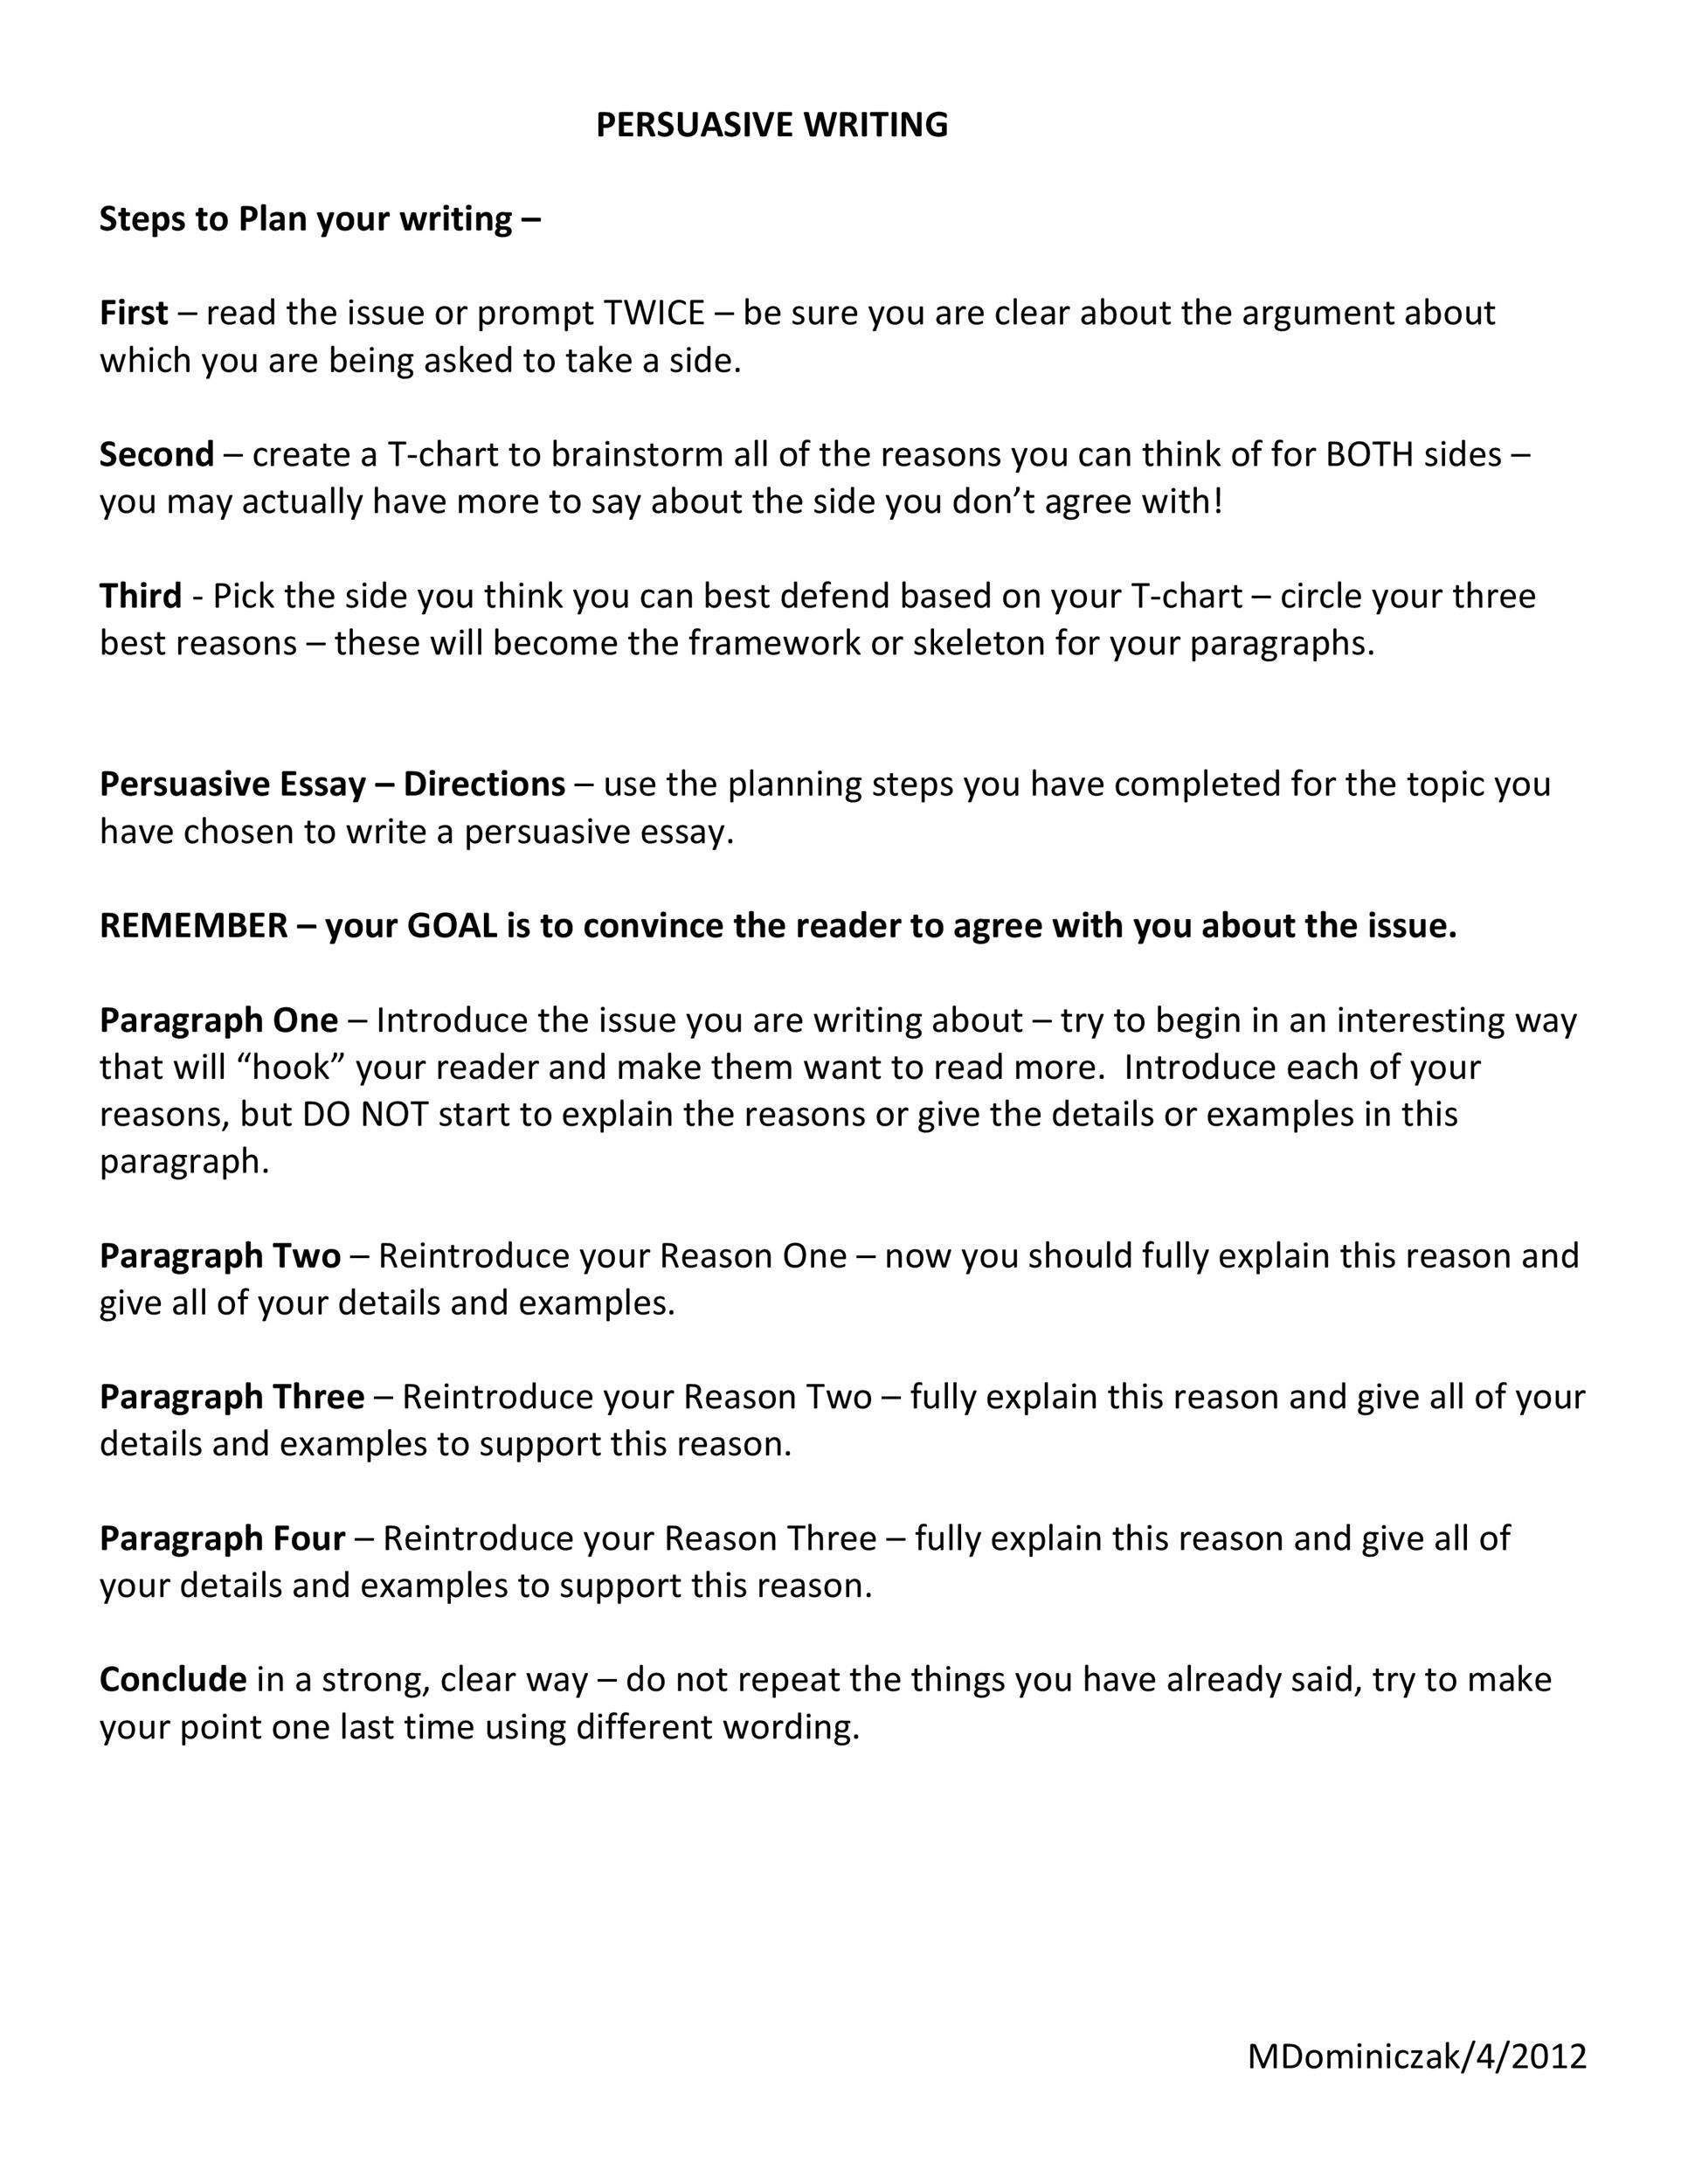 Free persuasive essay example 11